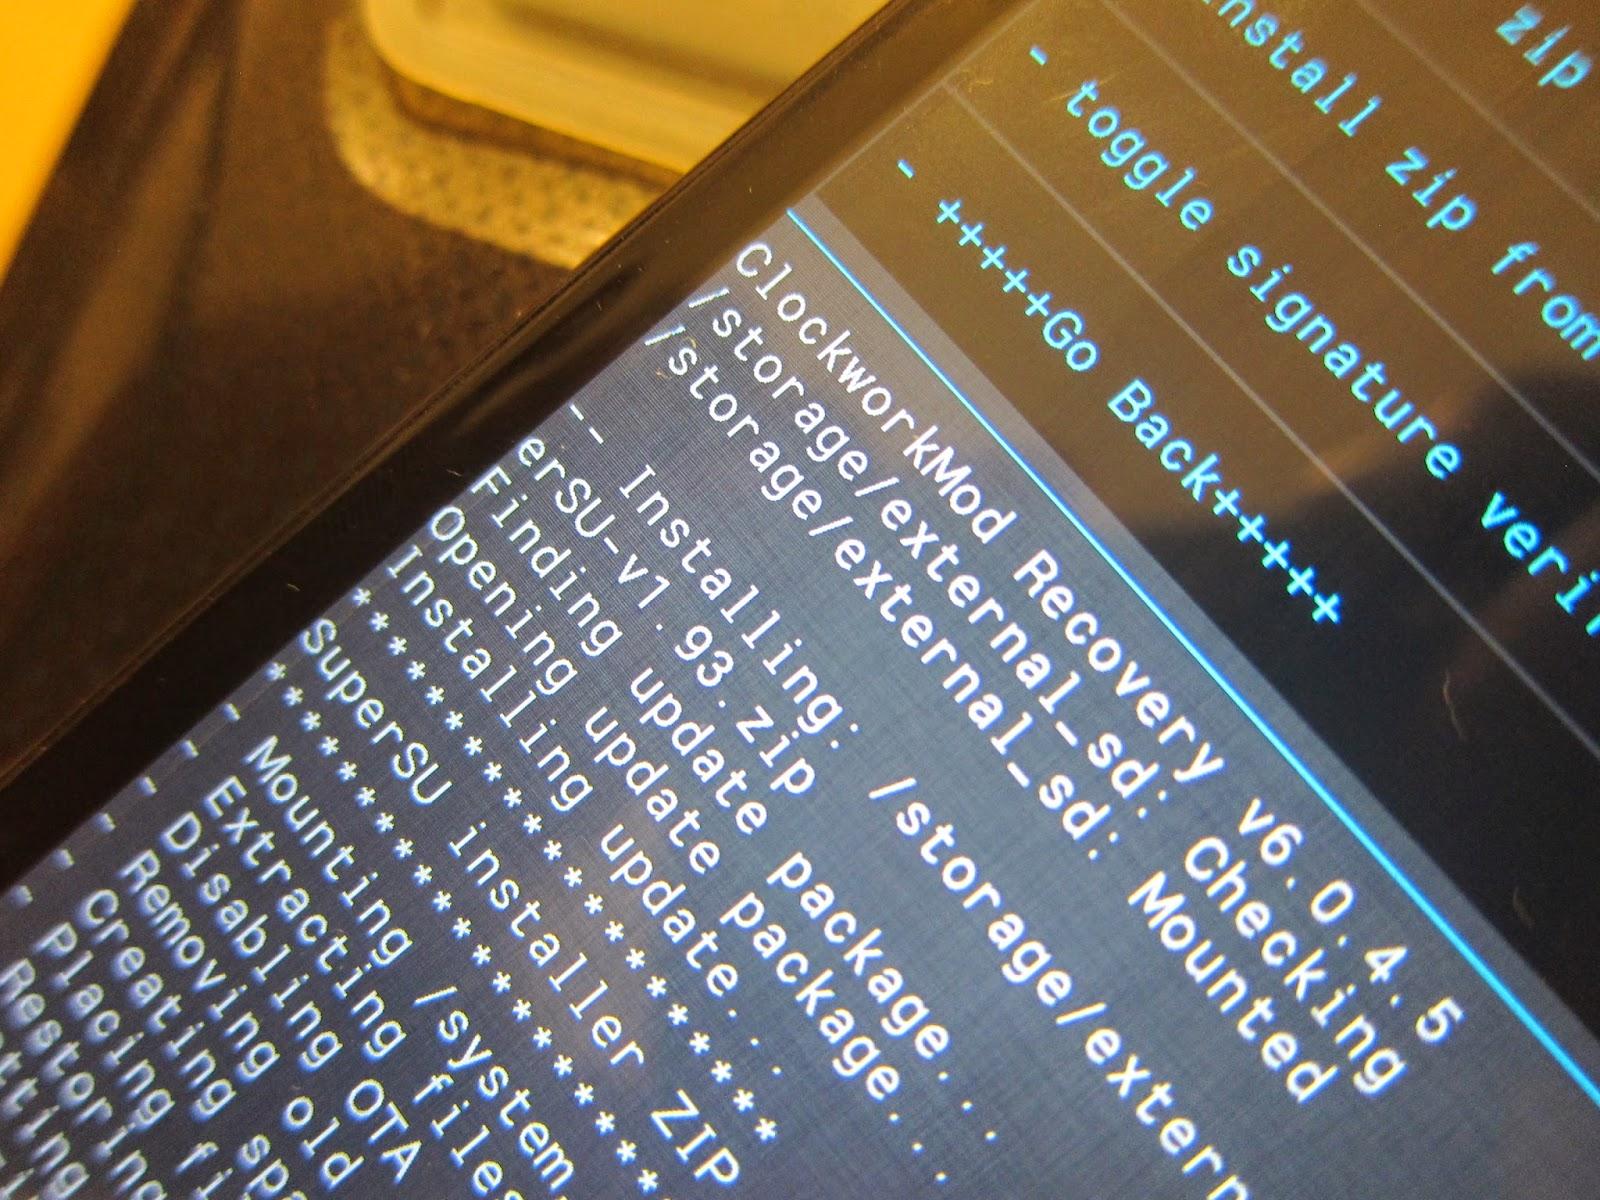 IMG 2335 - 【圖文教學】HTC Butterfly 4.3/4.4 解鎖+ROOT